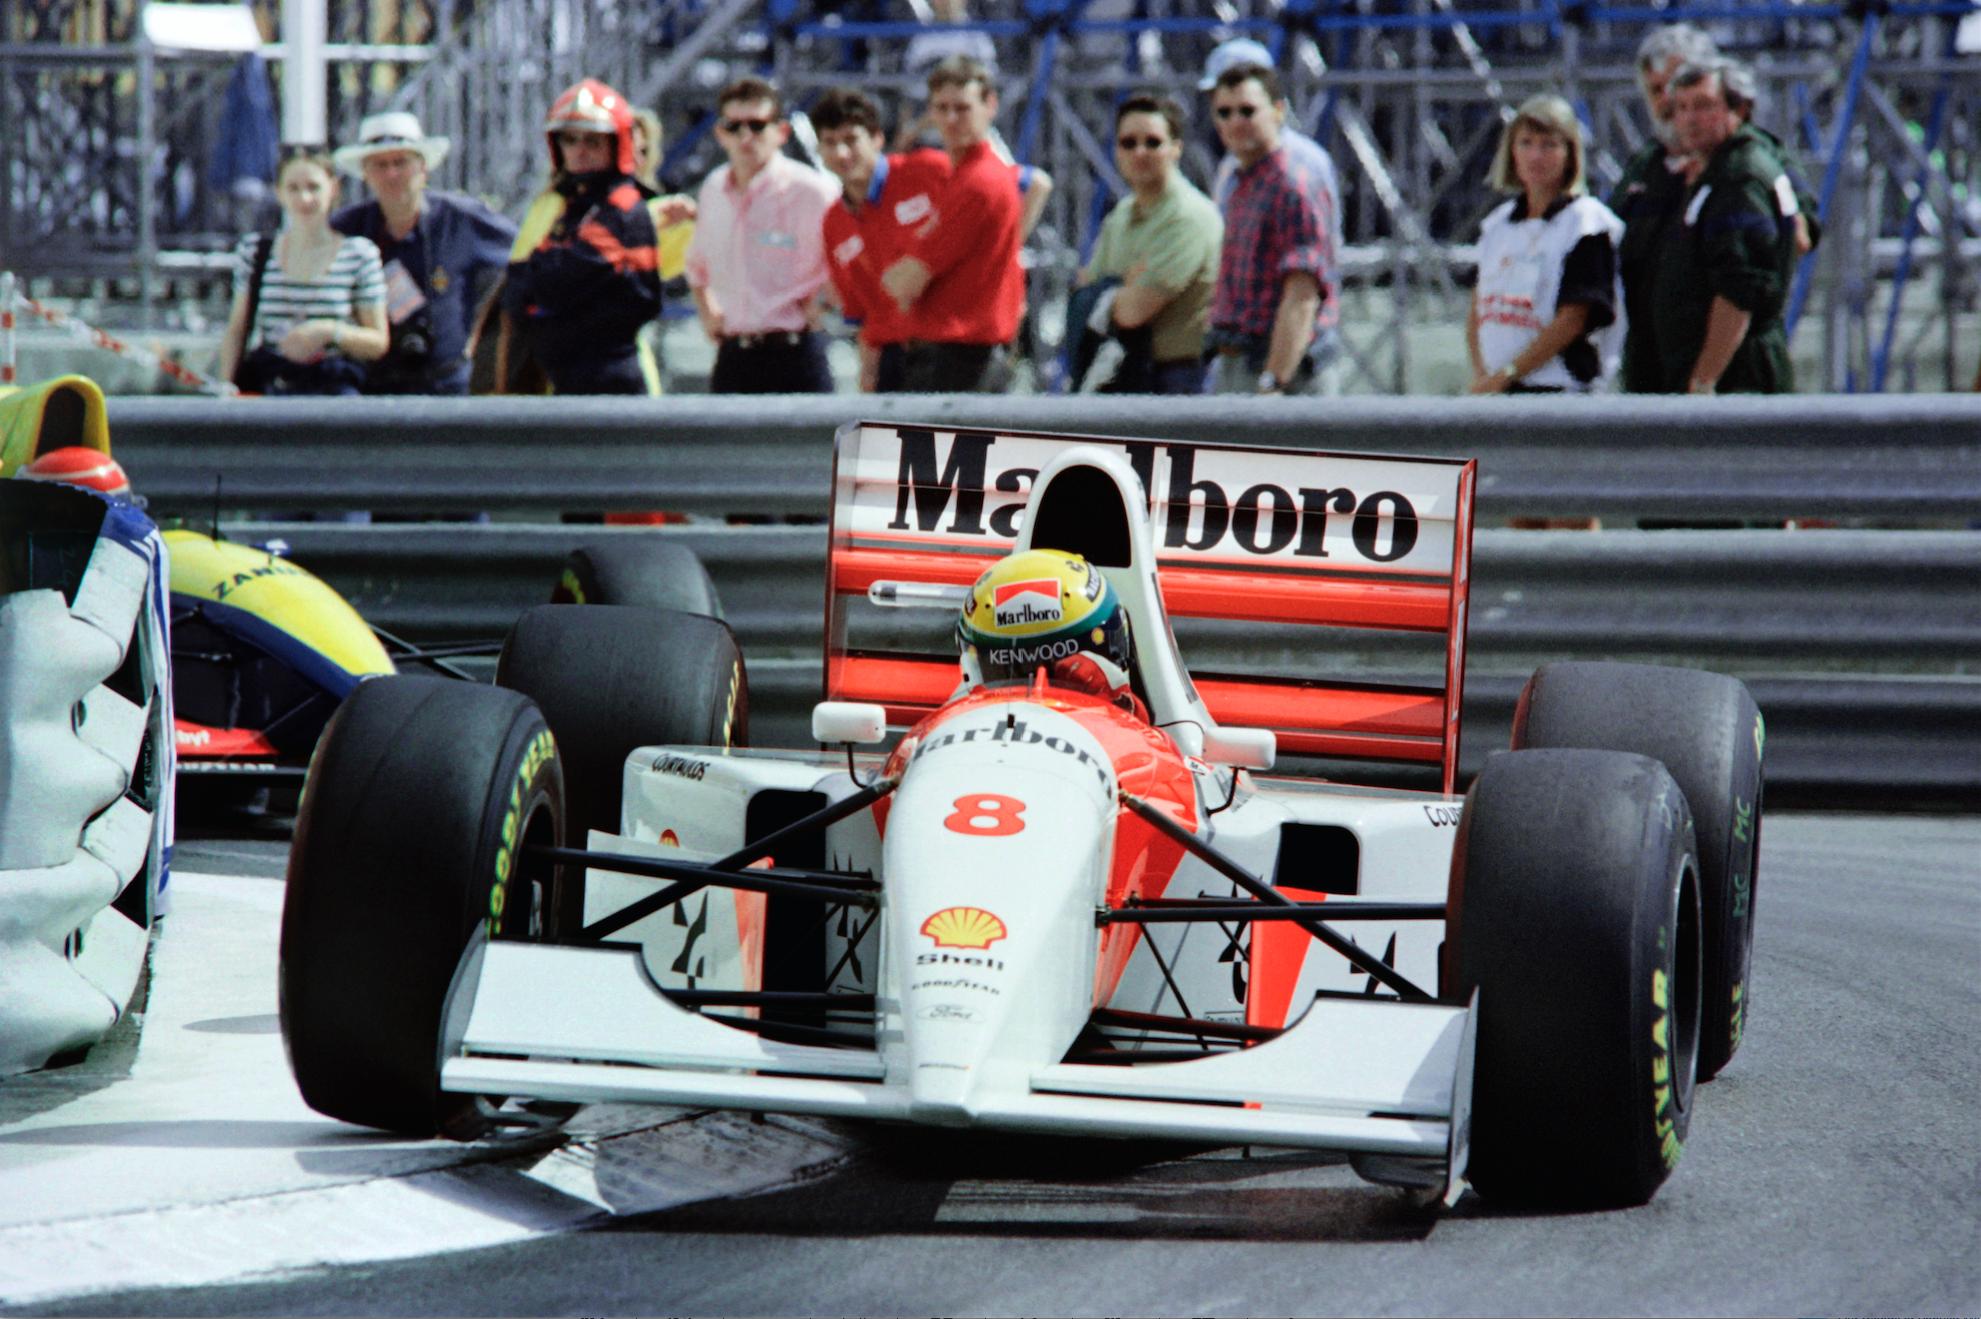 Ayrton Senna\'s Record-Breaking Monaco GP Formula 1 Car Heads to Auction